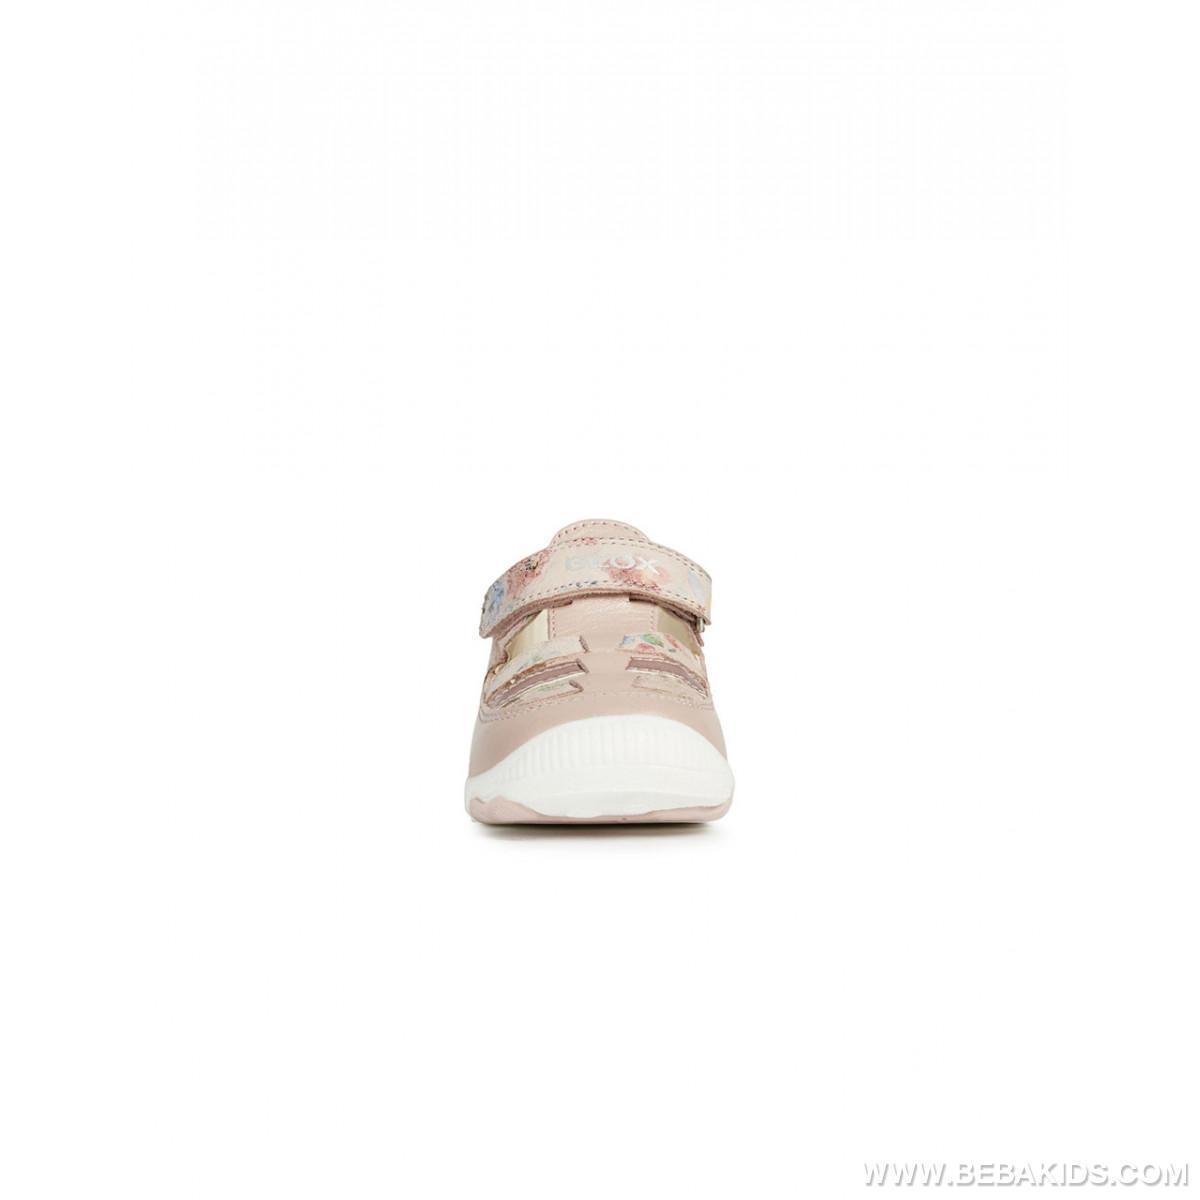 Geox sandale